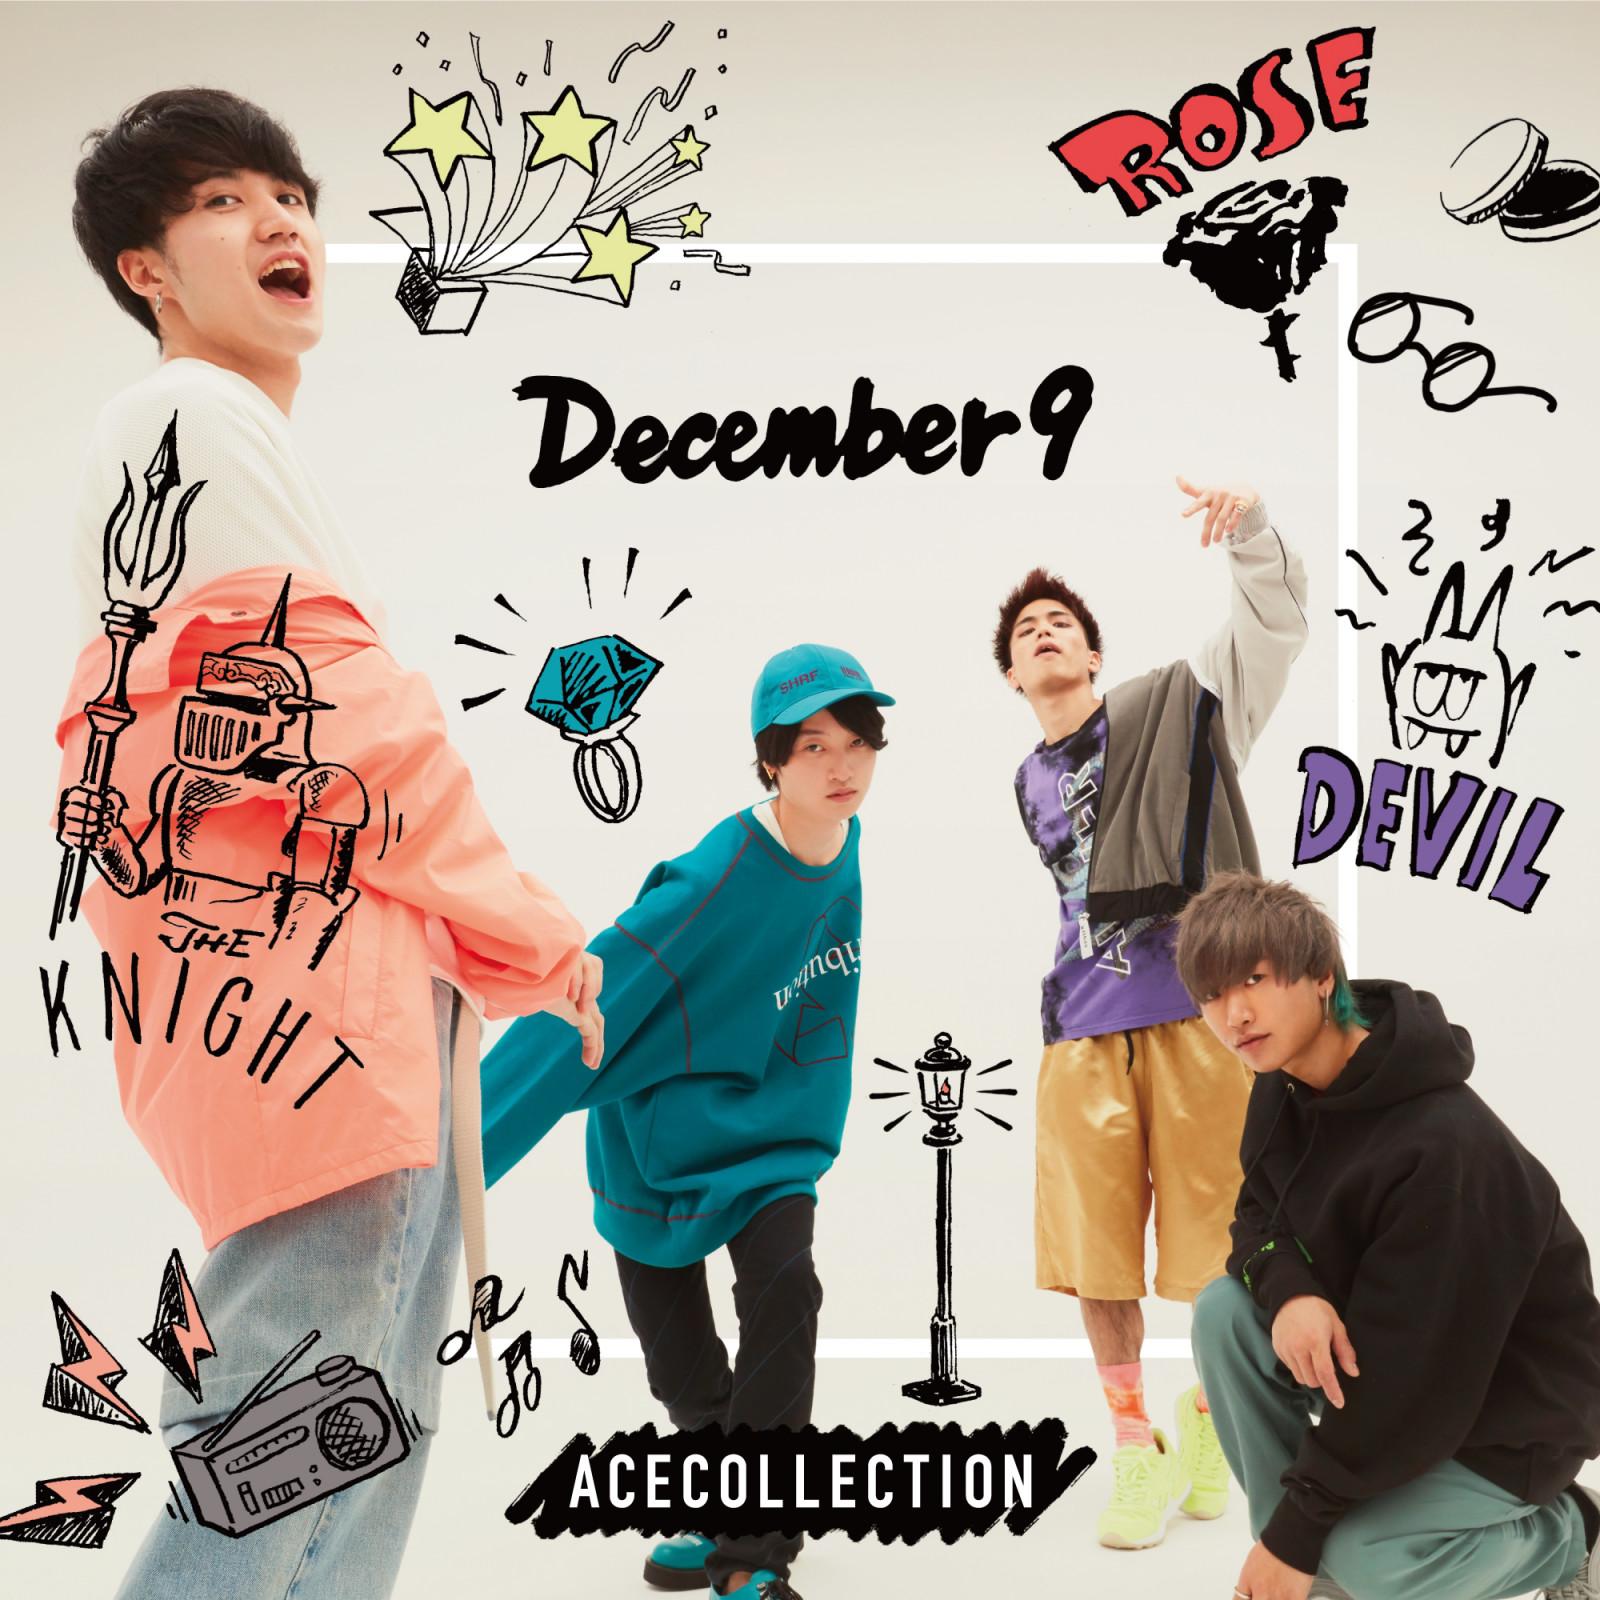 December 9